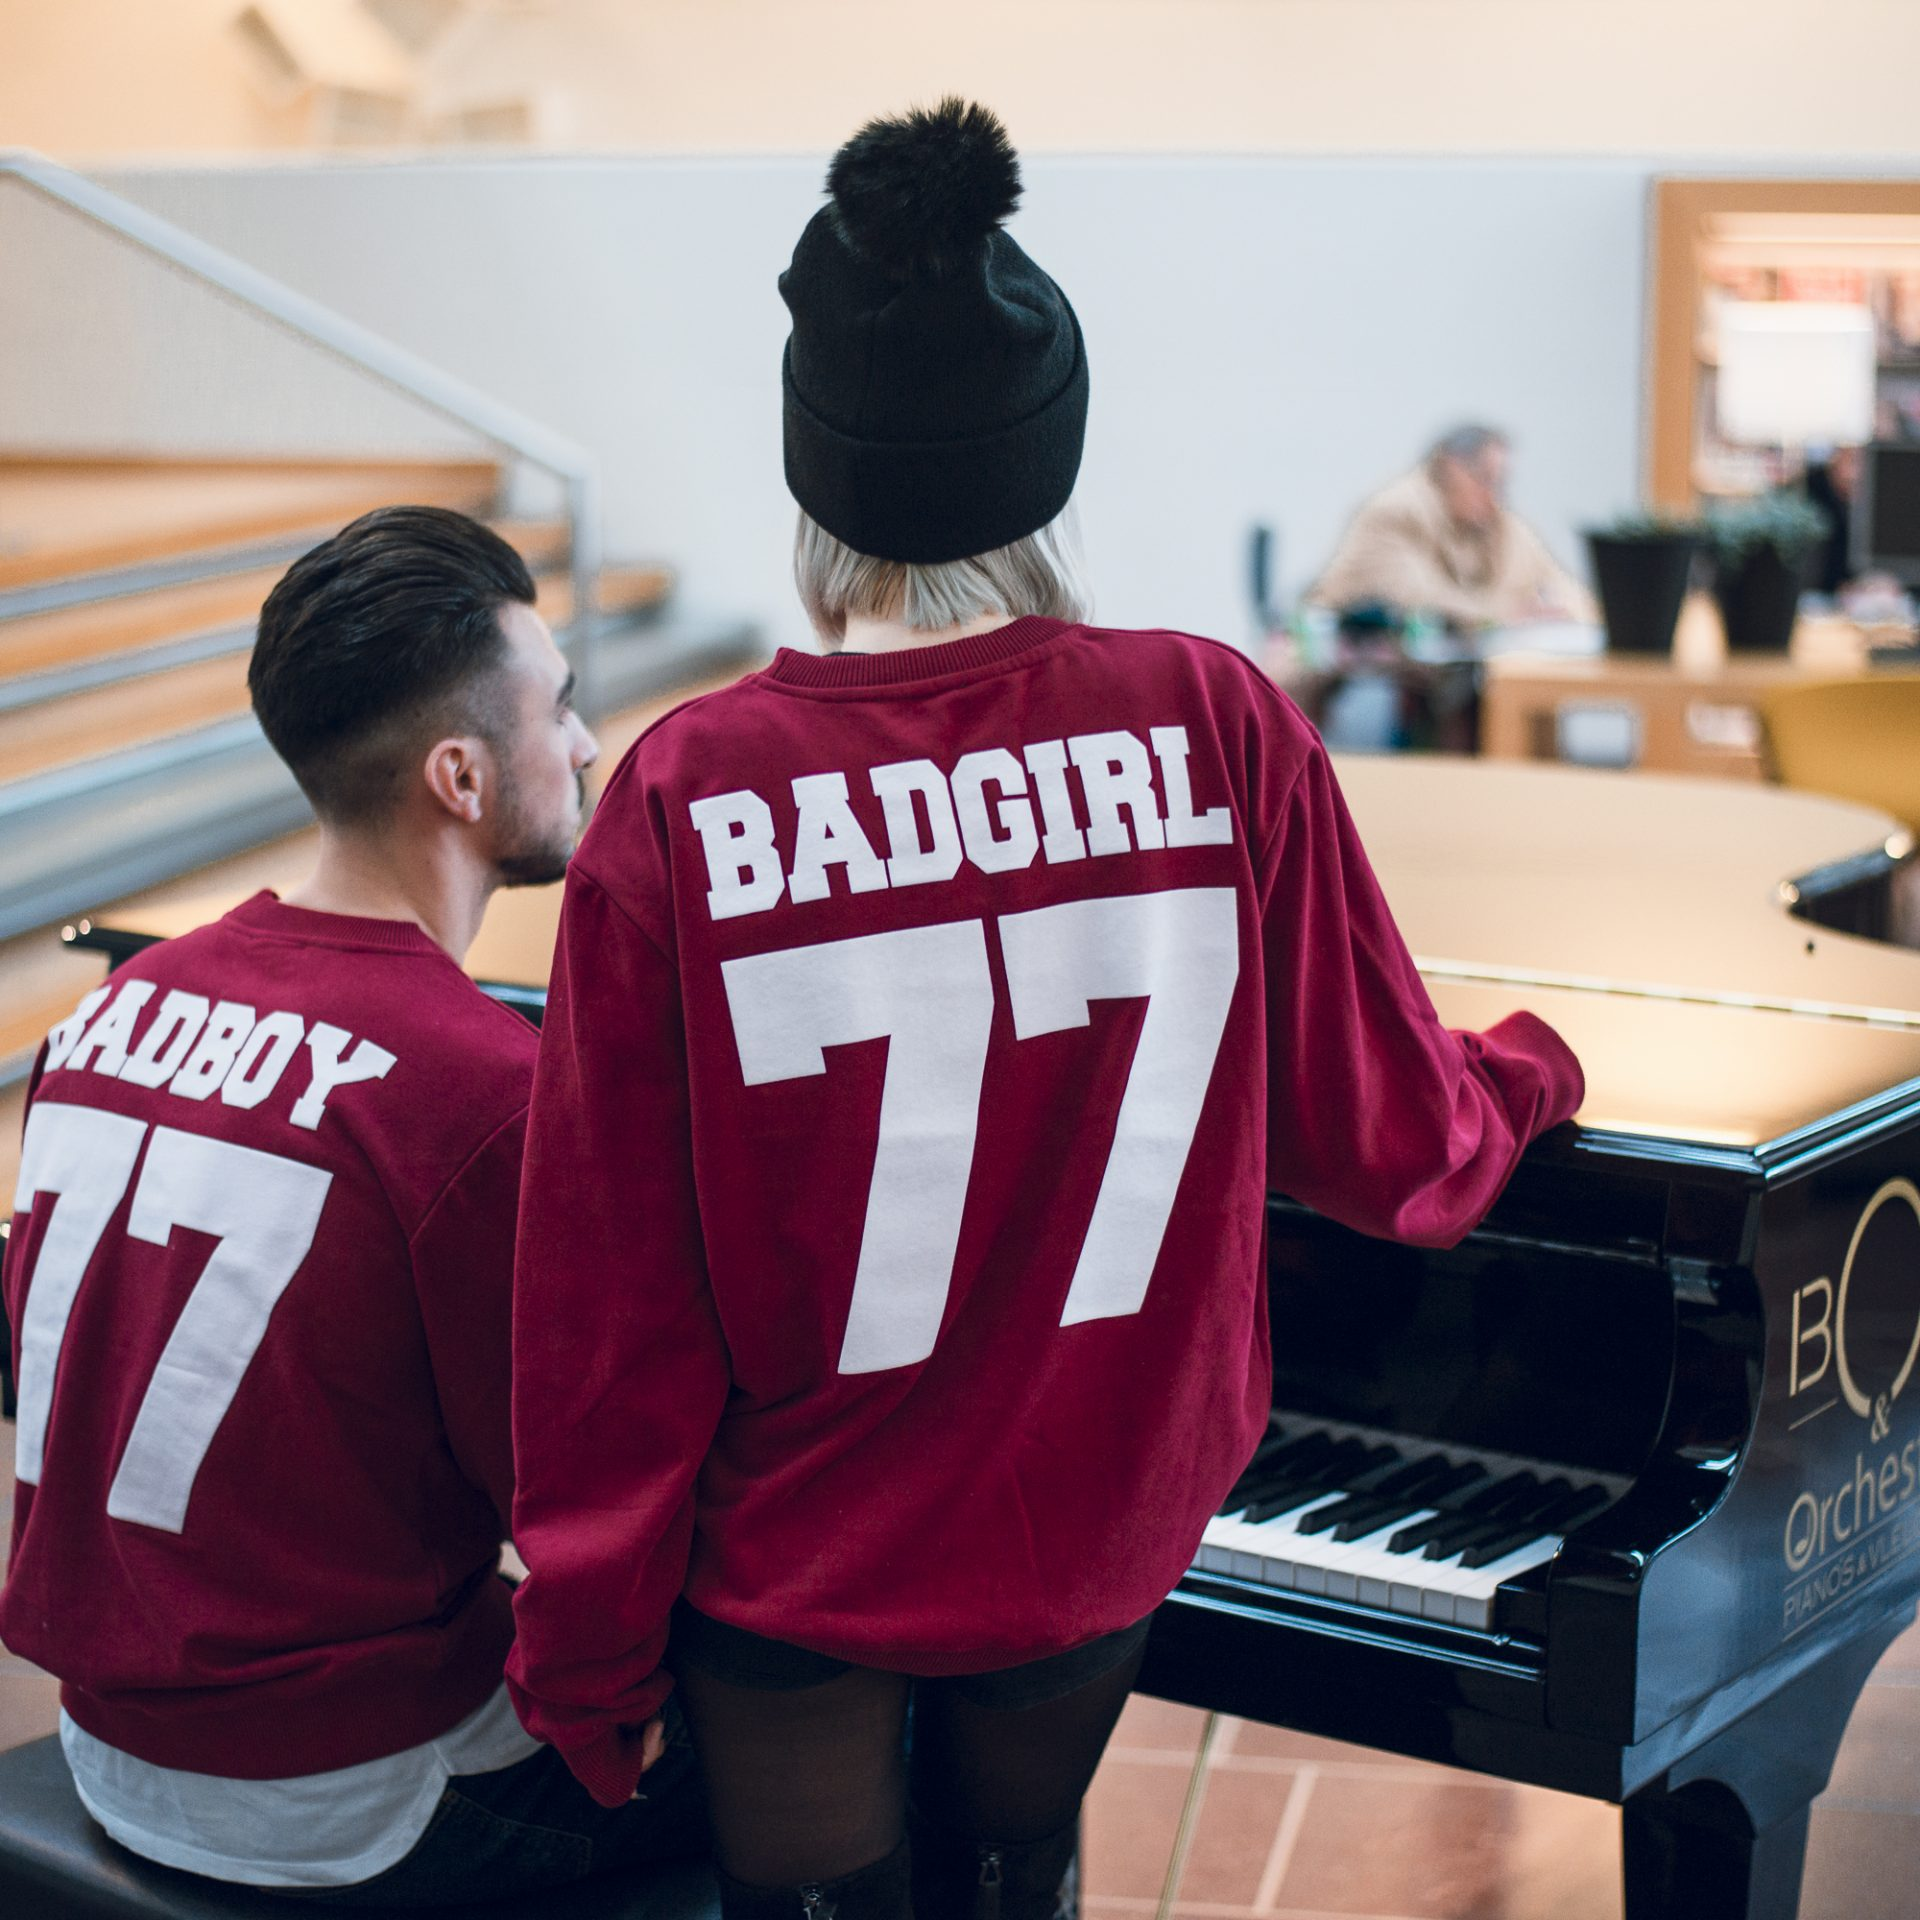 BADBOY BADGIRL COUPLE SWEATERS